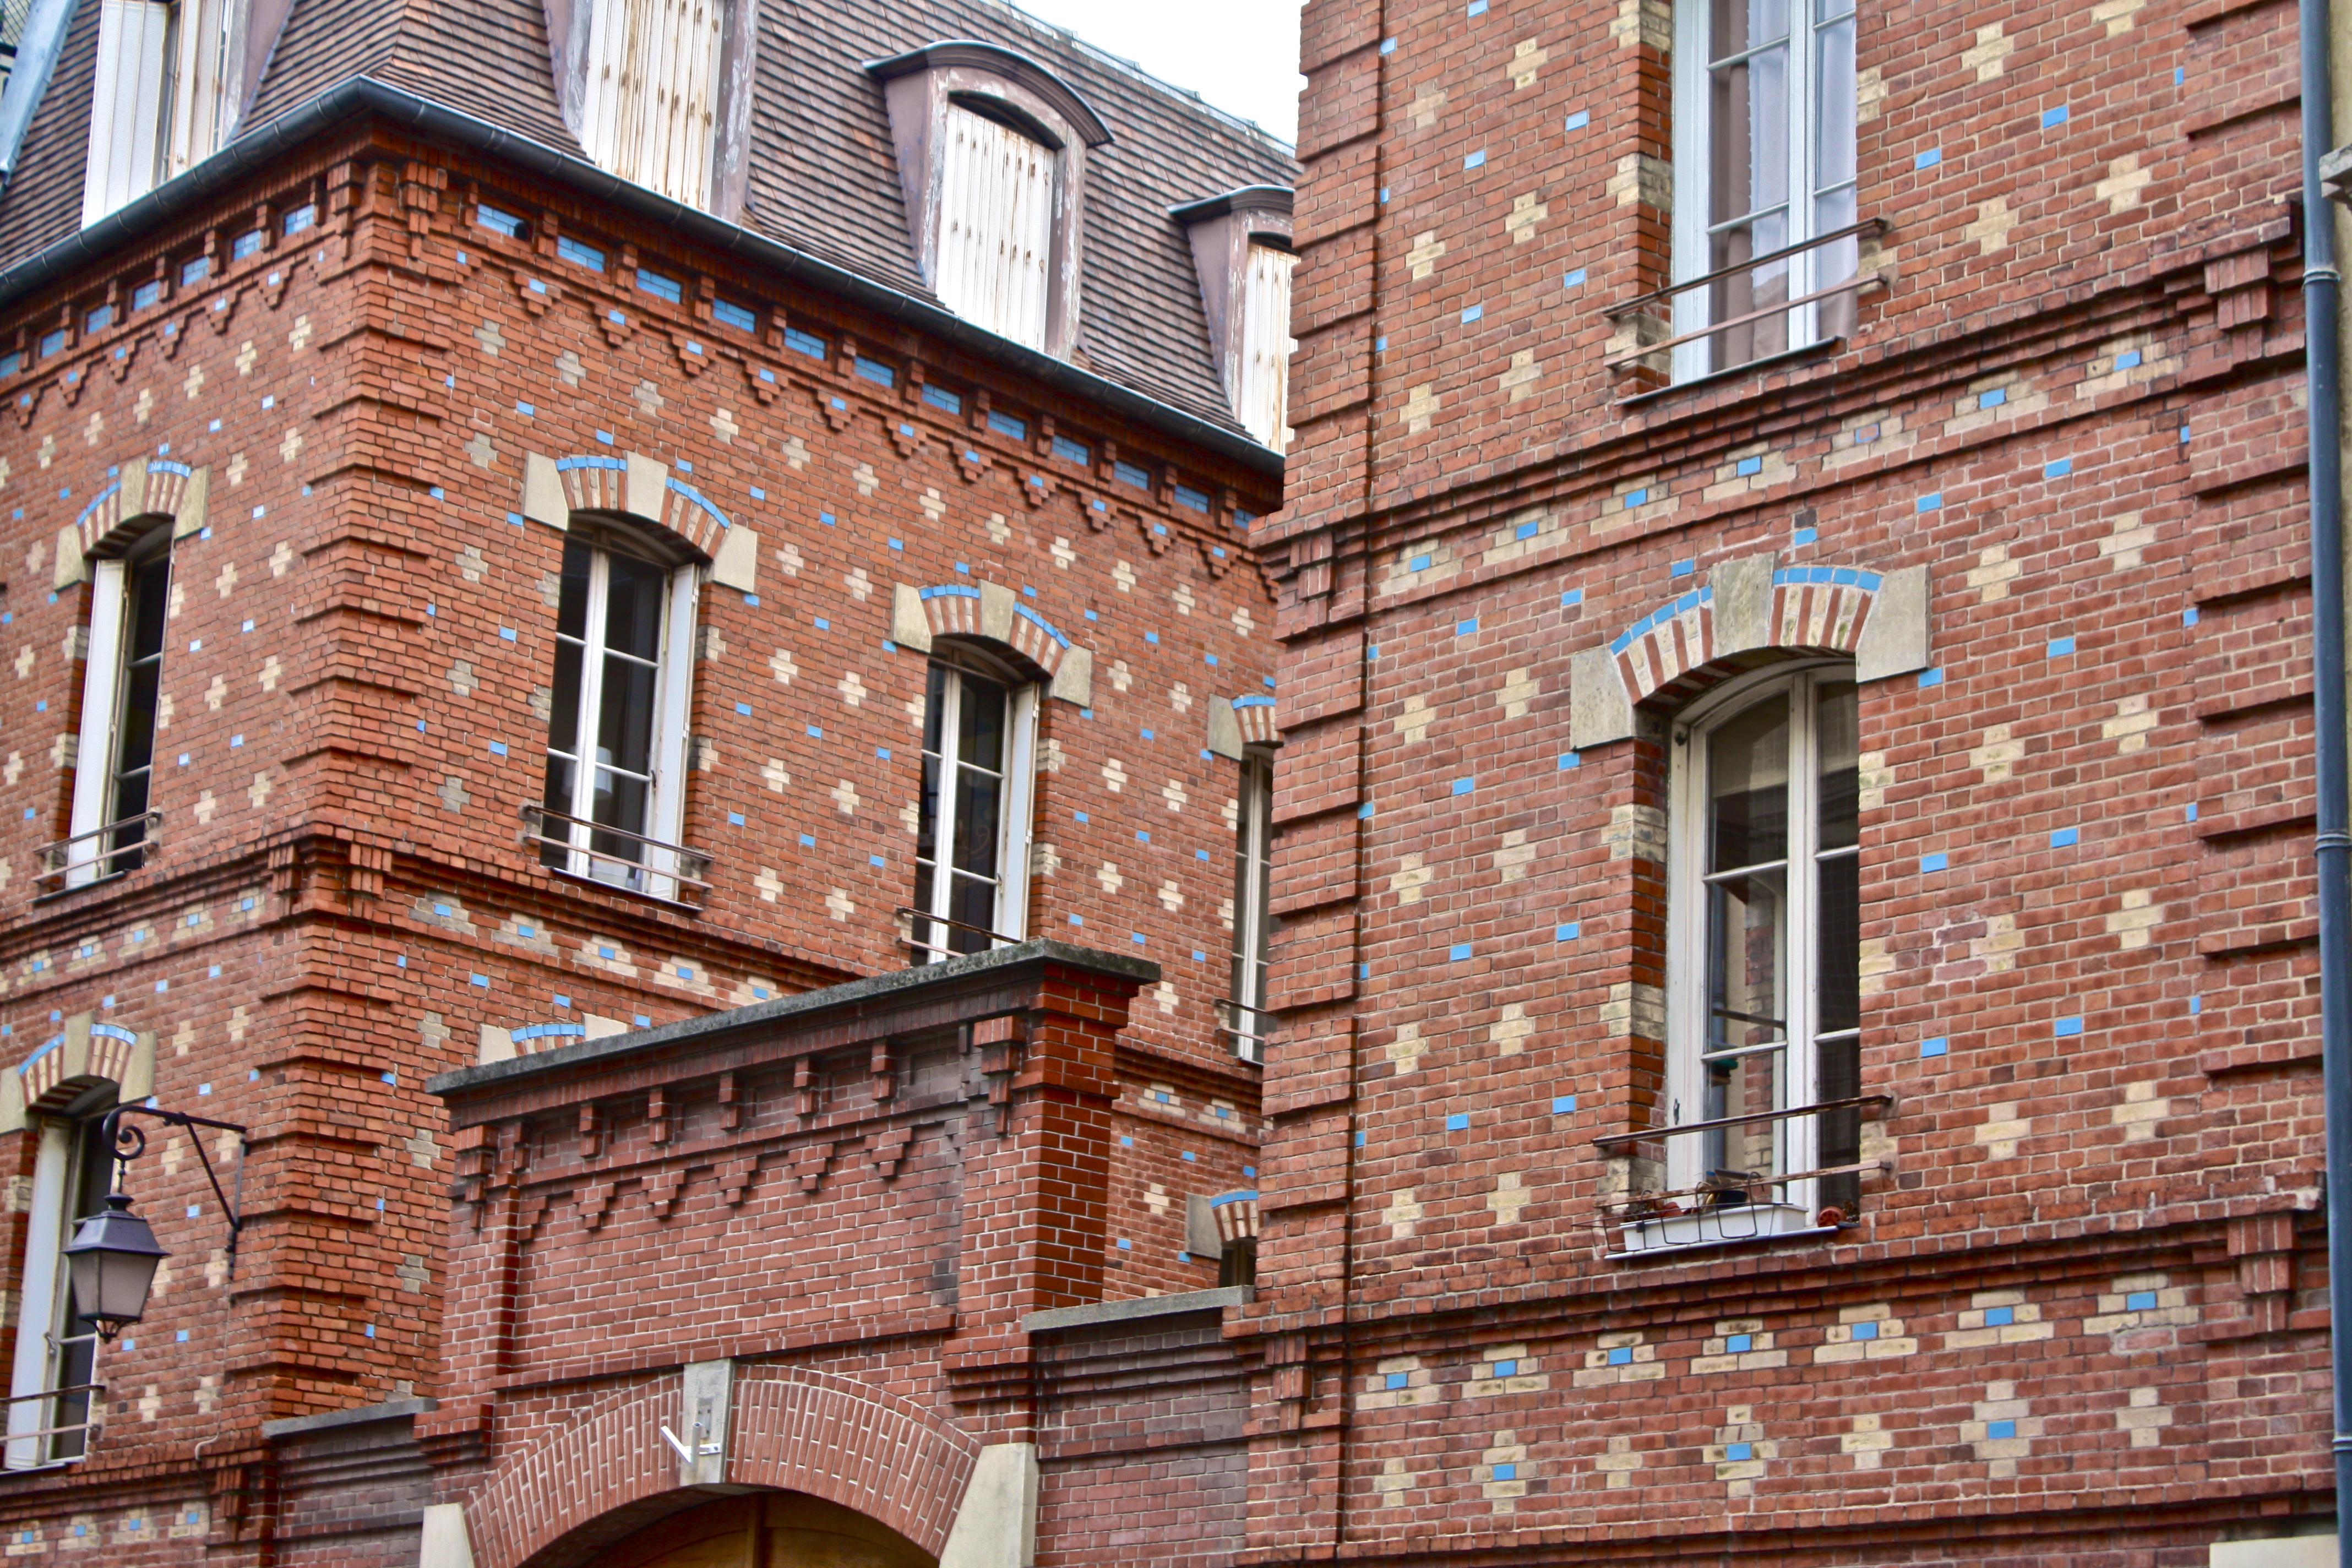 an interesting brick building facade paris france anthropogen. Black Bedroom Furniture Sets. Home Design Ideas